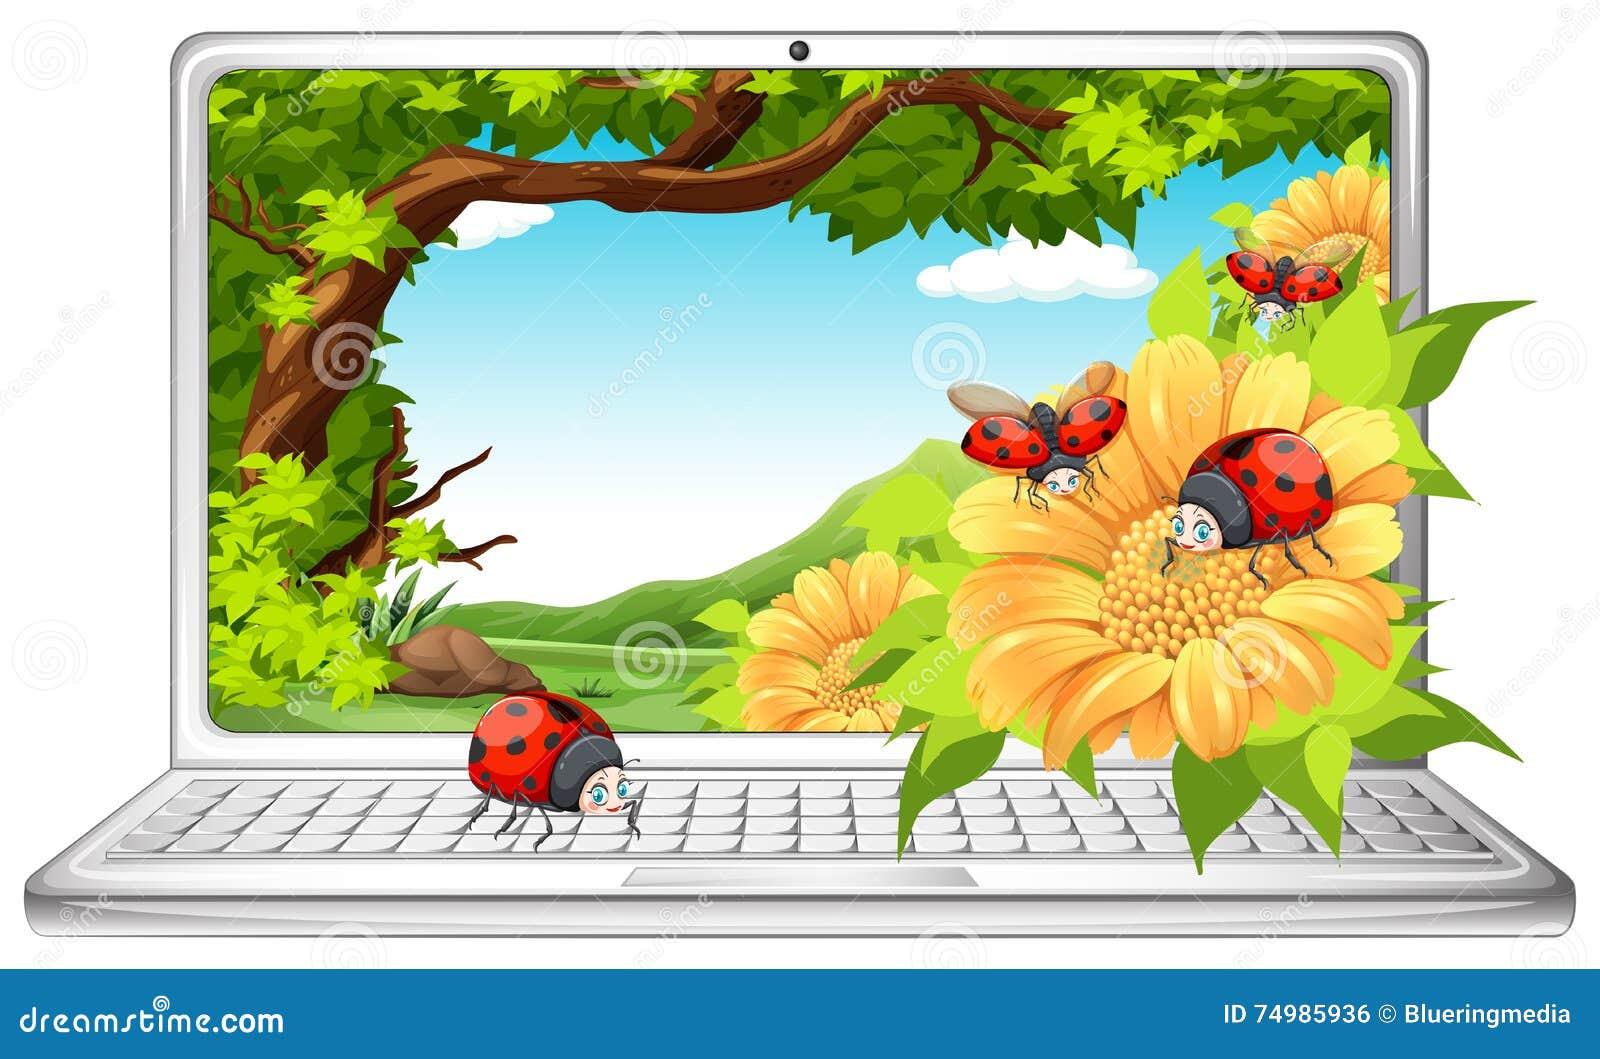 Marvelous Ladybugs In Garden On Computer Screen